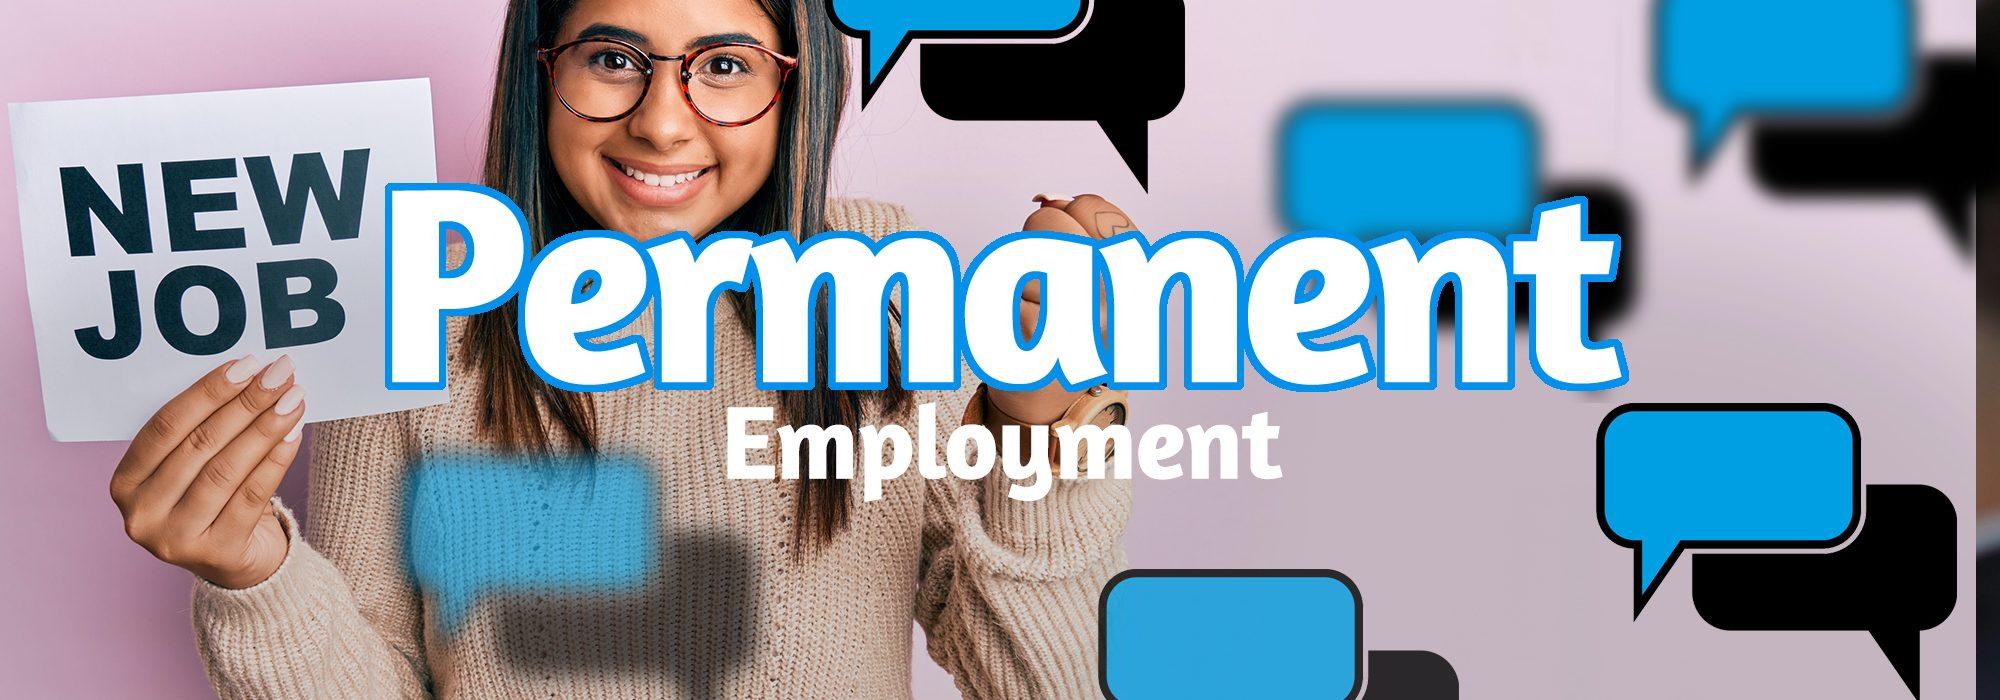 Permanent Employment